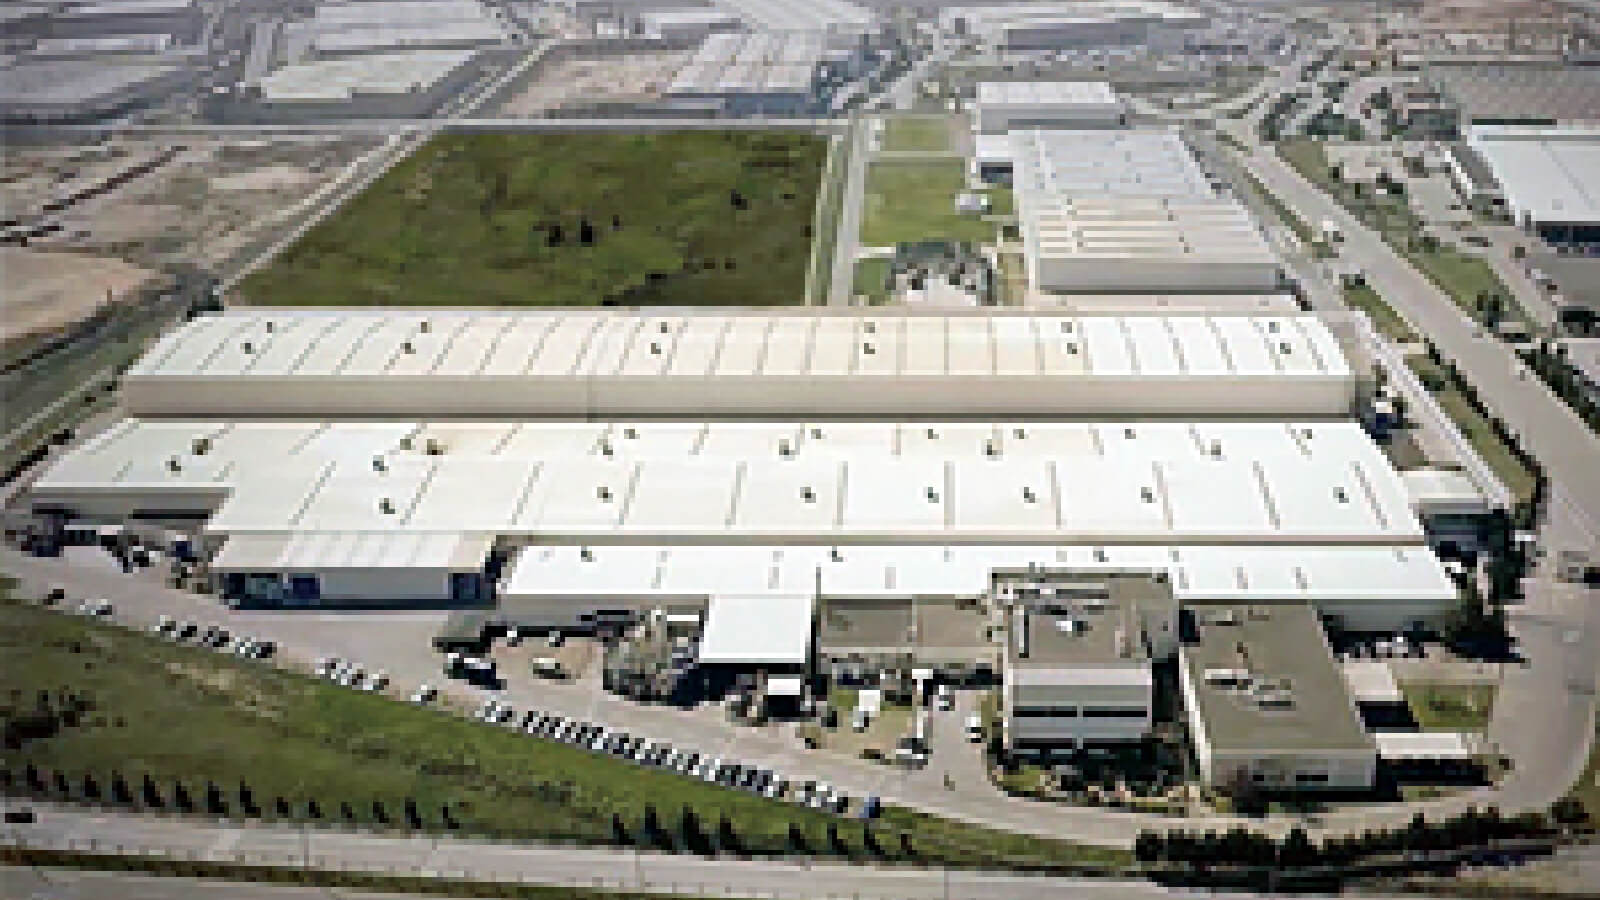 Toyotetsu Otomotiv Parcalari Sanayi Ve Ticaret A.S. (TTTI)